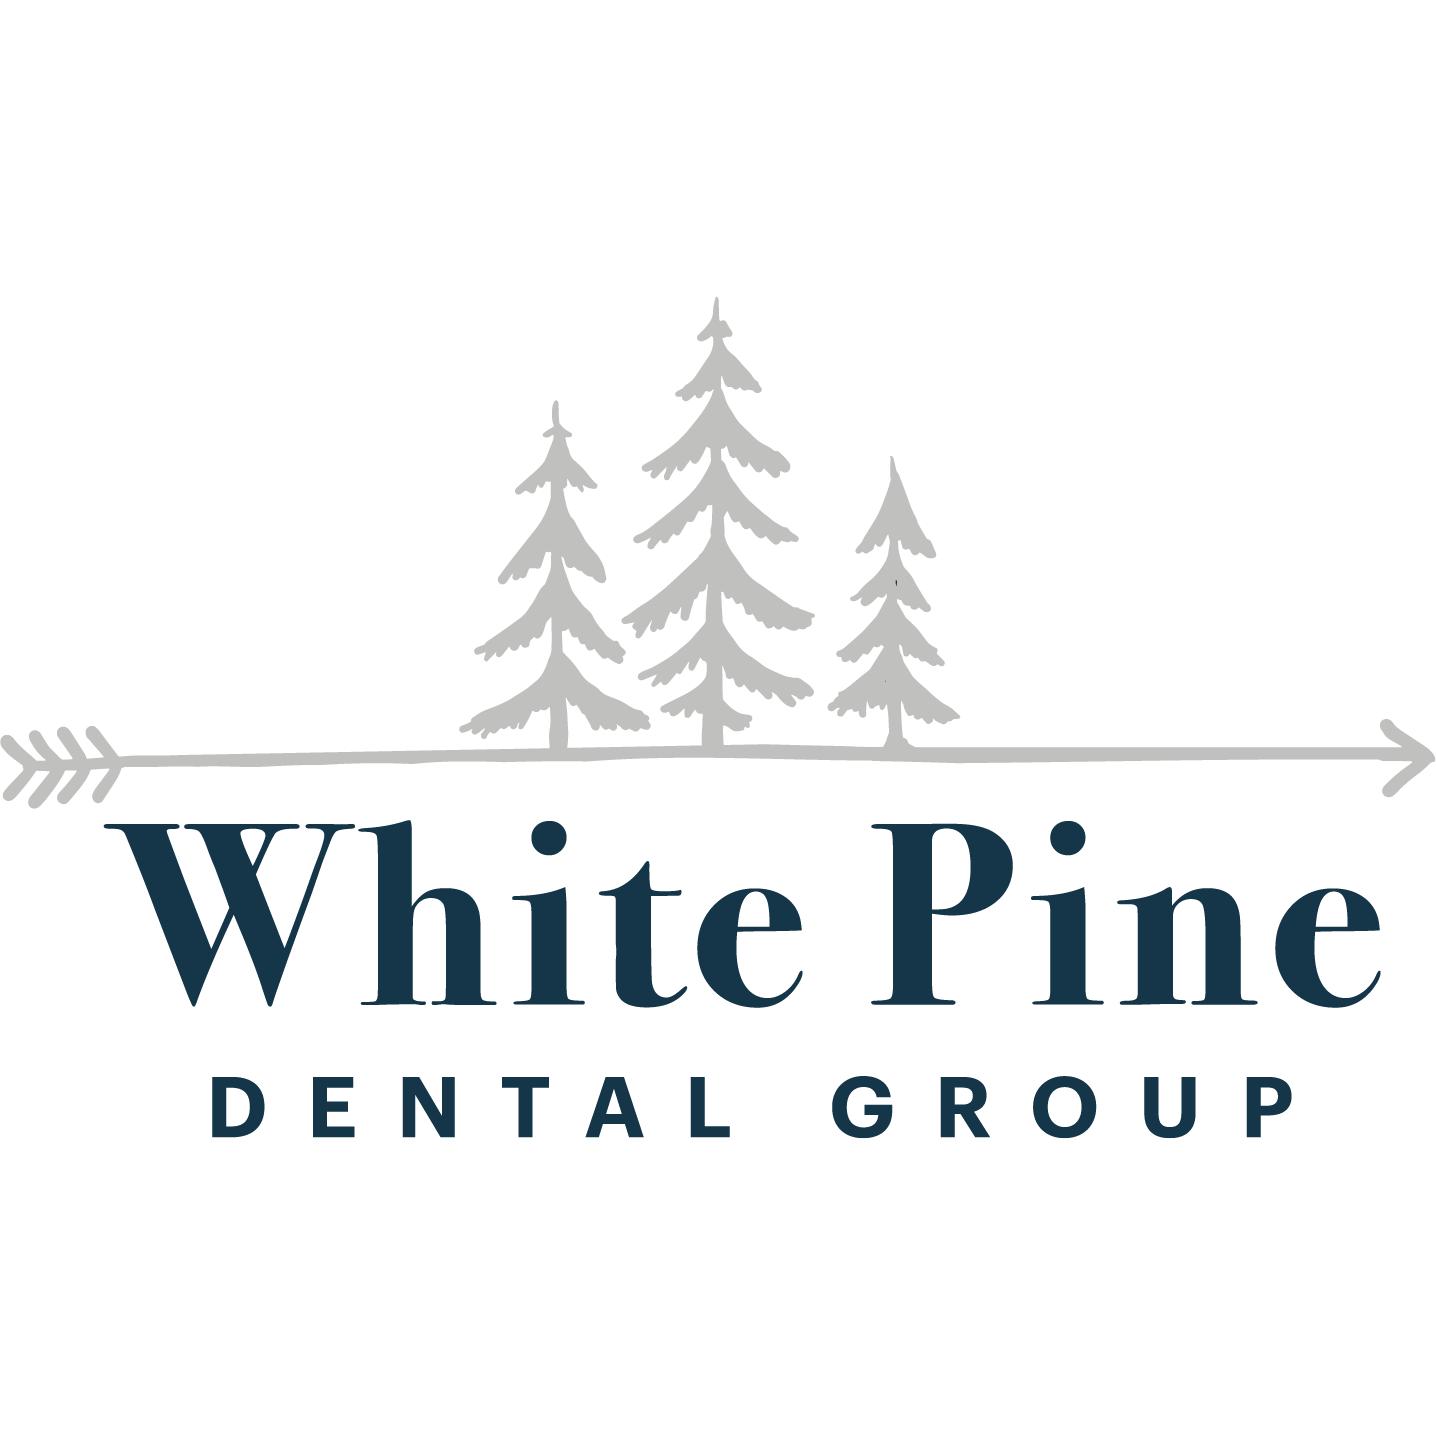 White Pine Dental Group